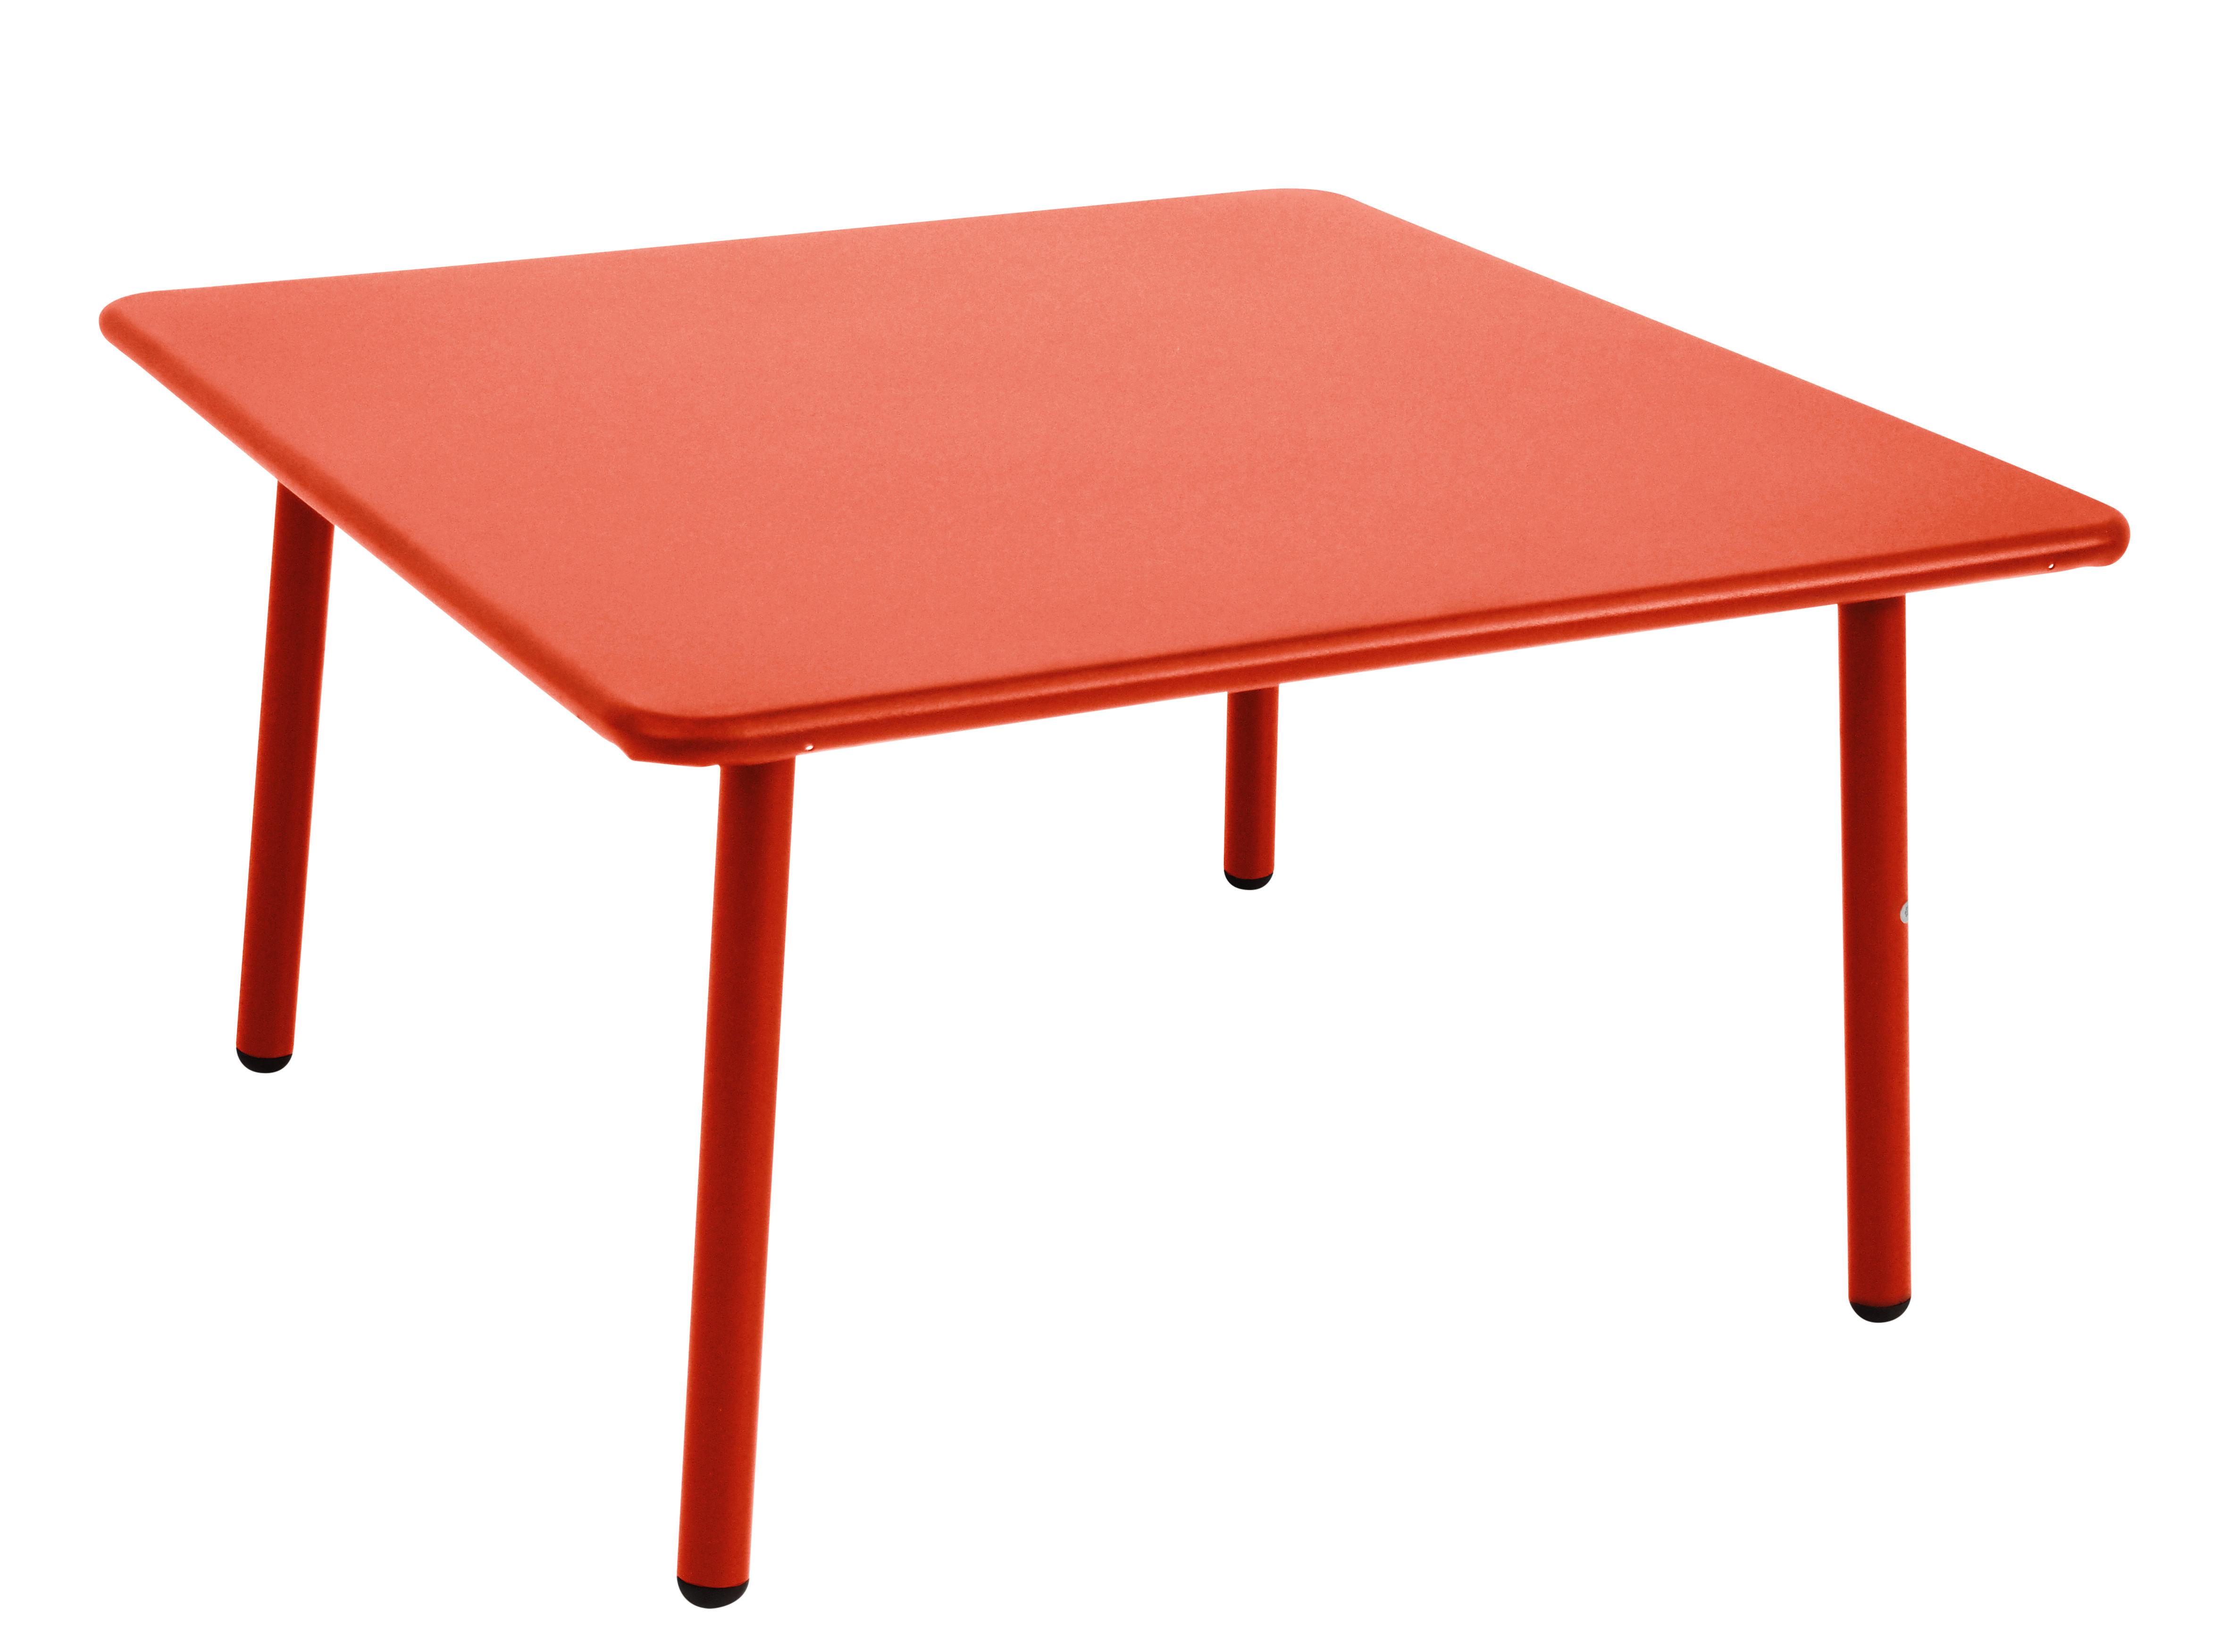 darwin coffee table 70 x 70 cm scarlet by emu